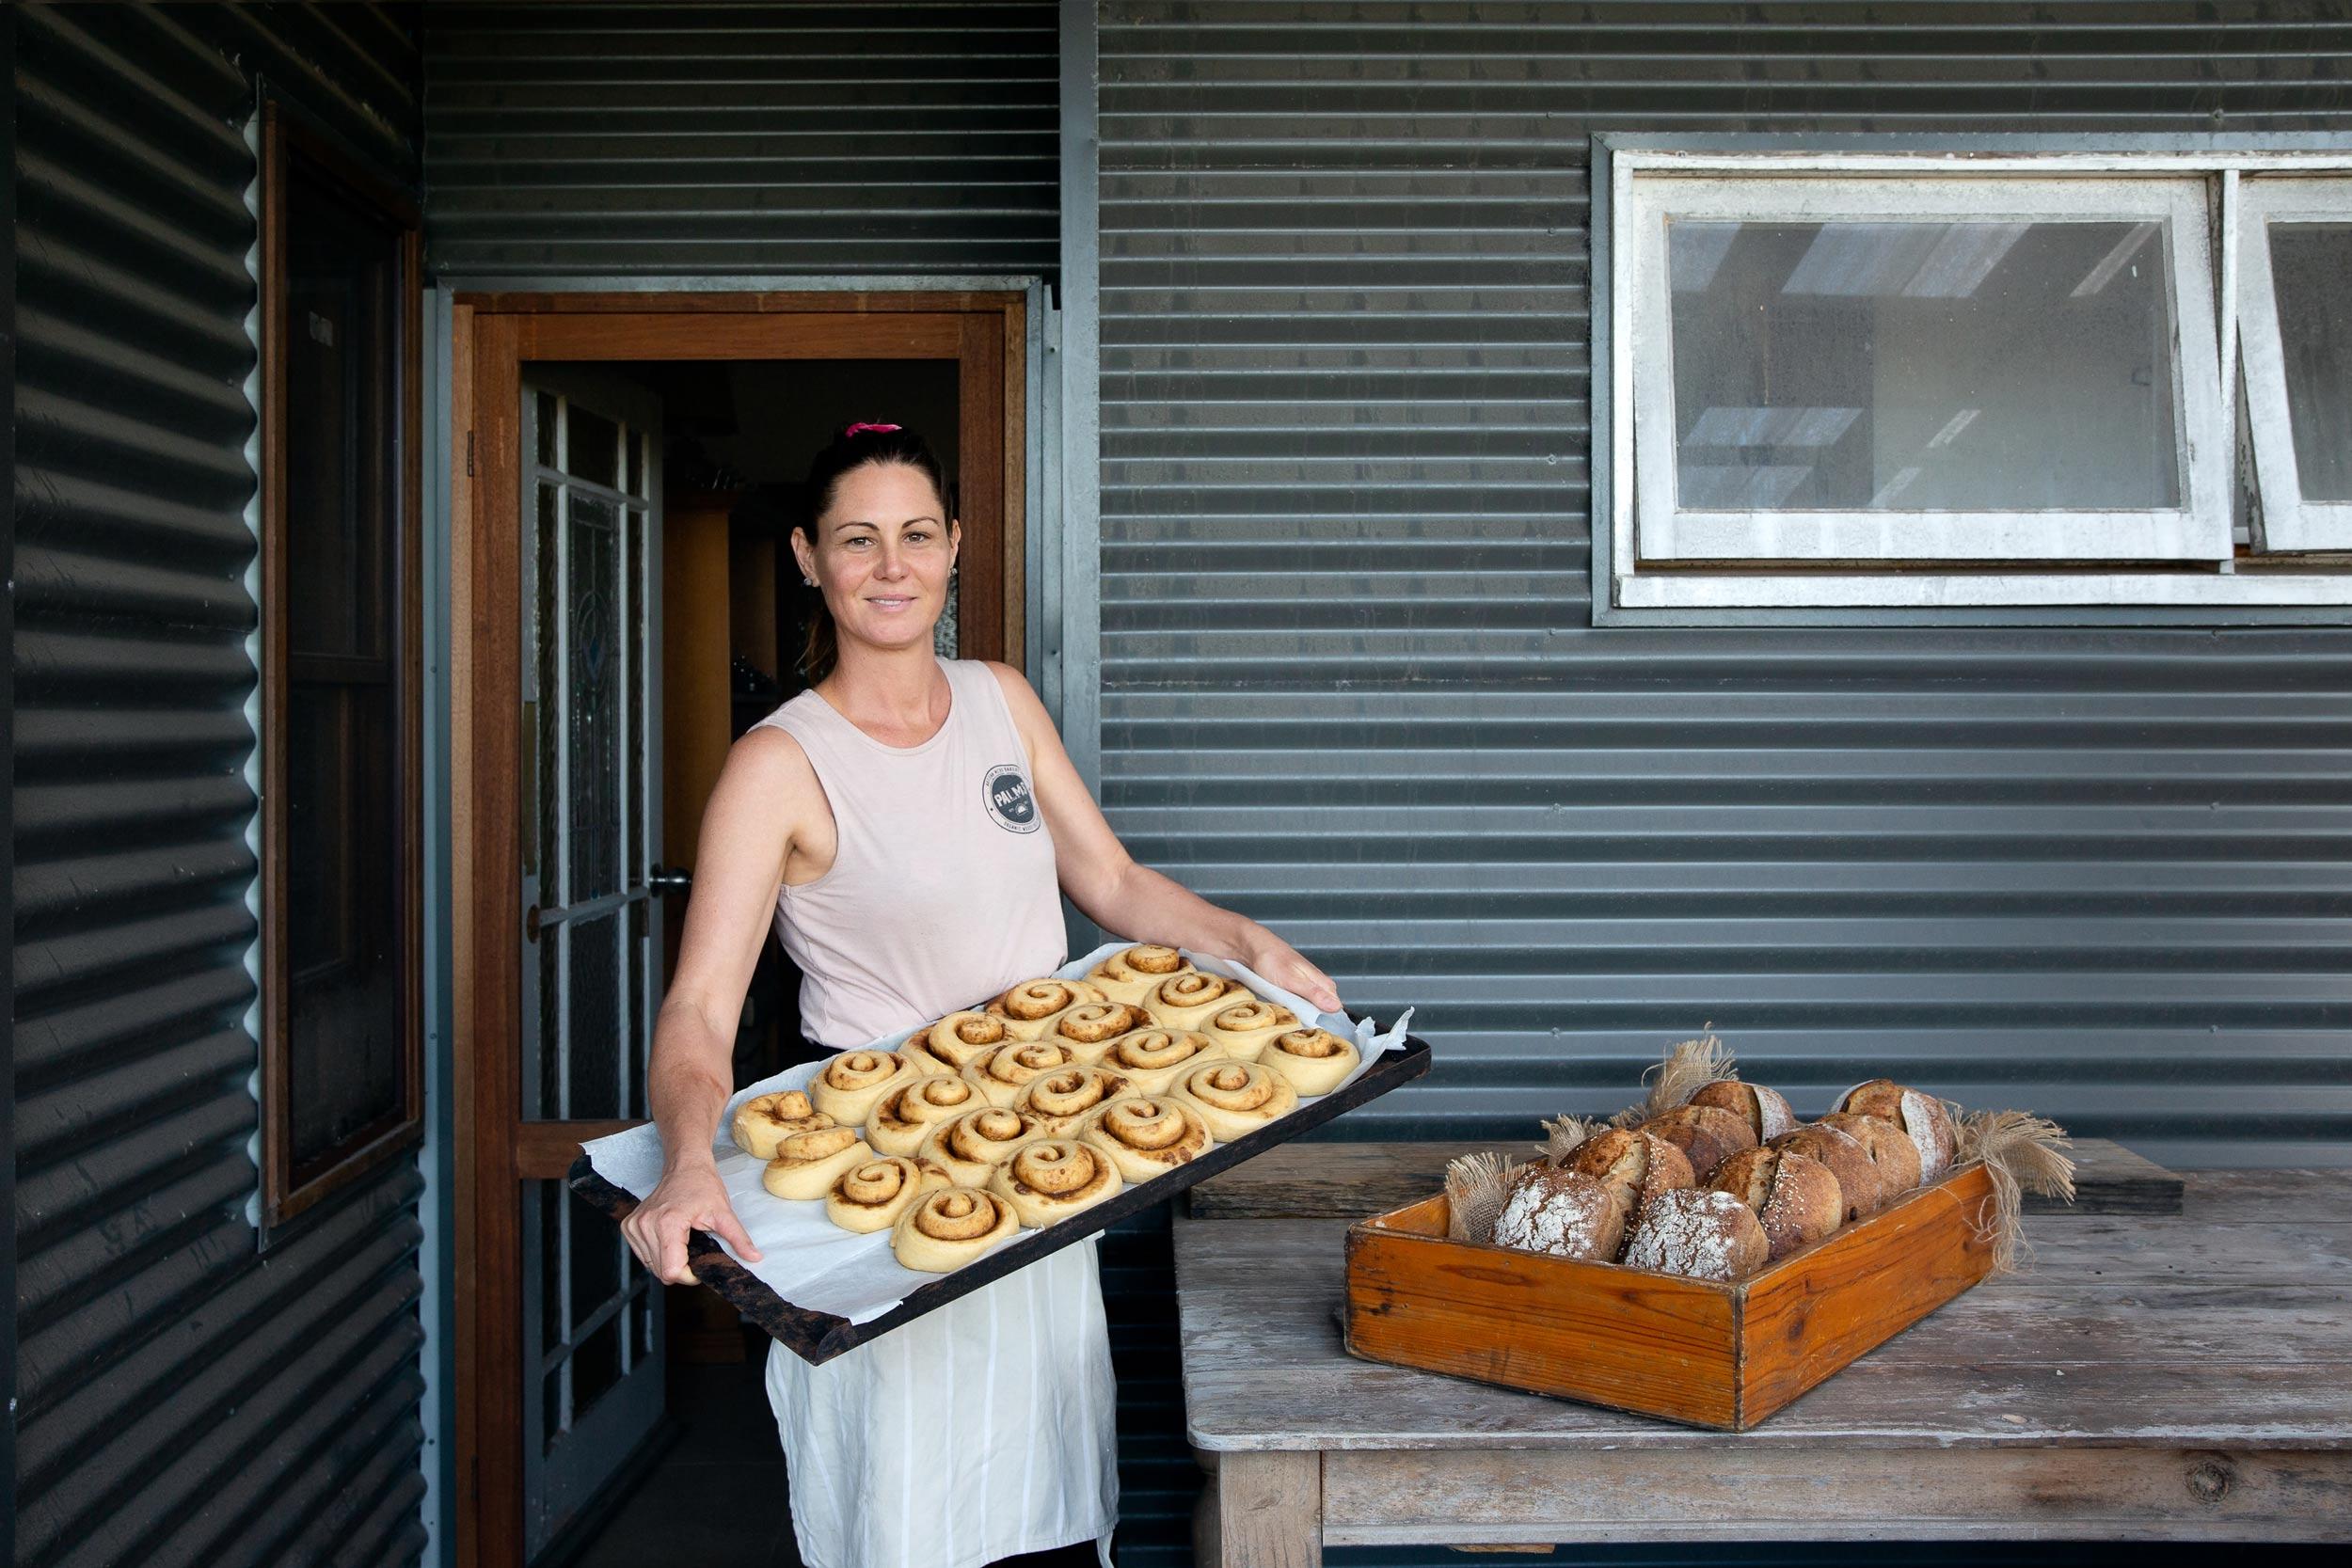 glft-palms-micro-bakery-lara-webber.jpg